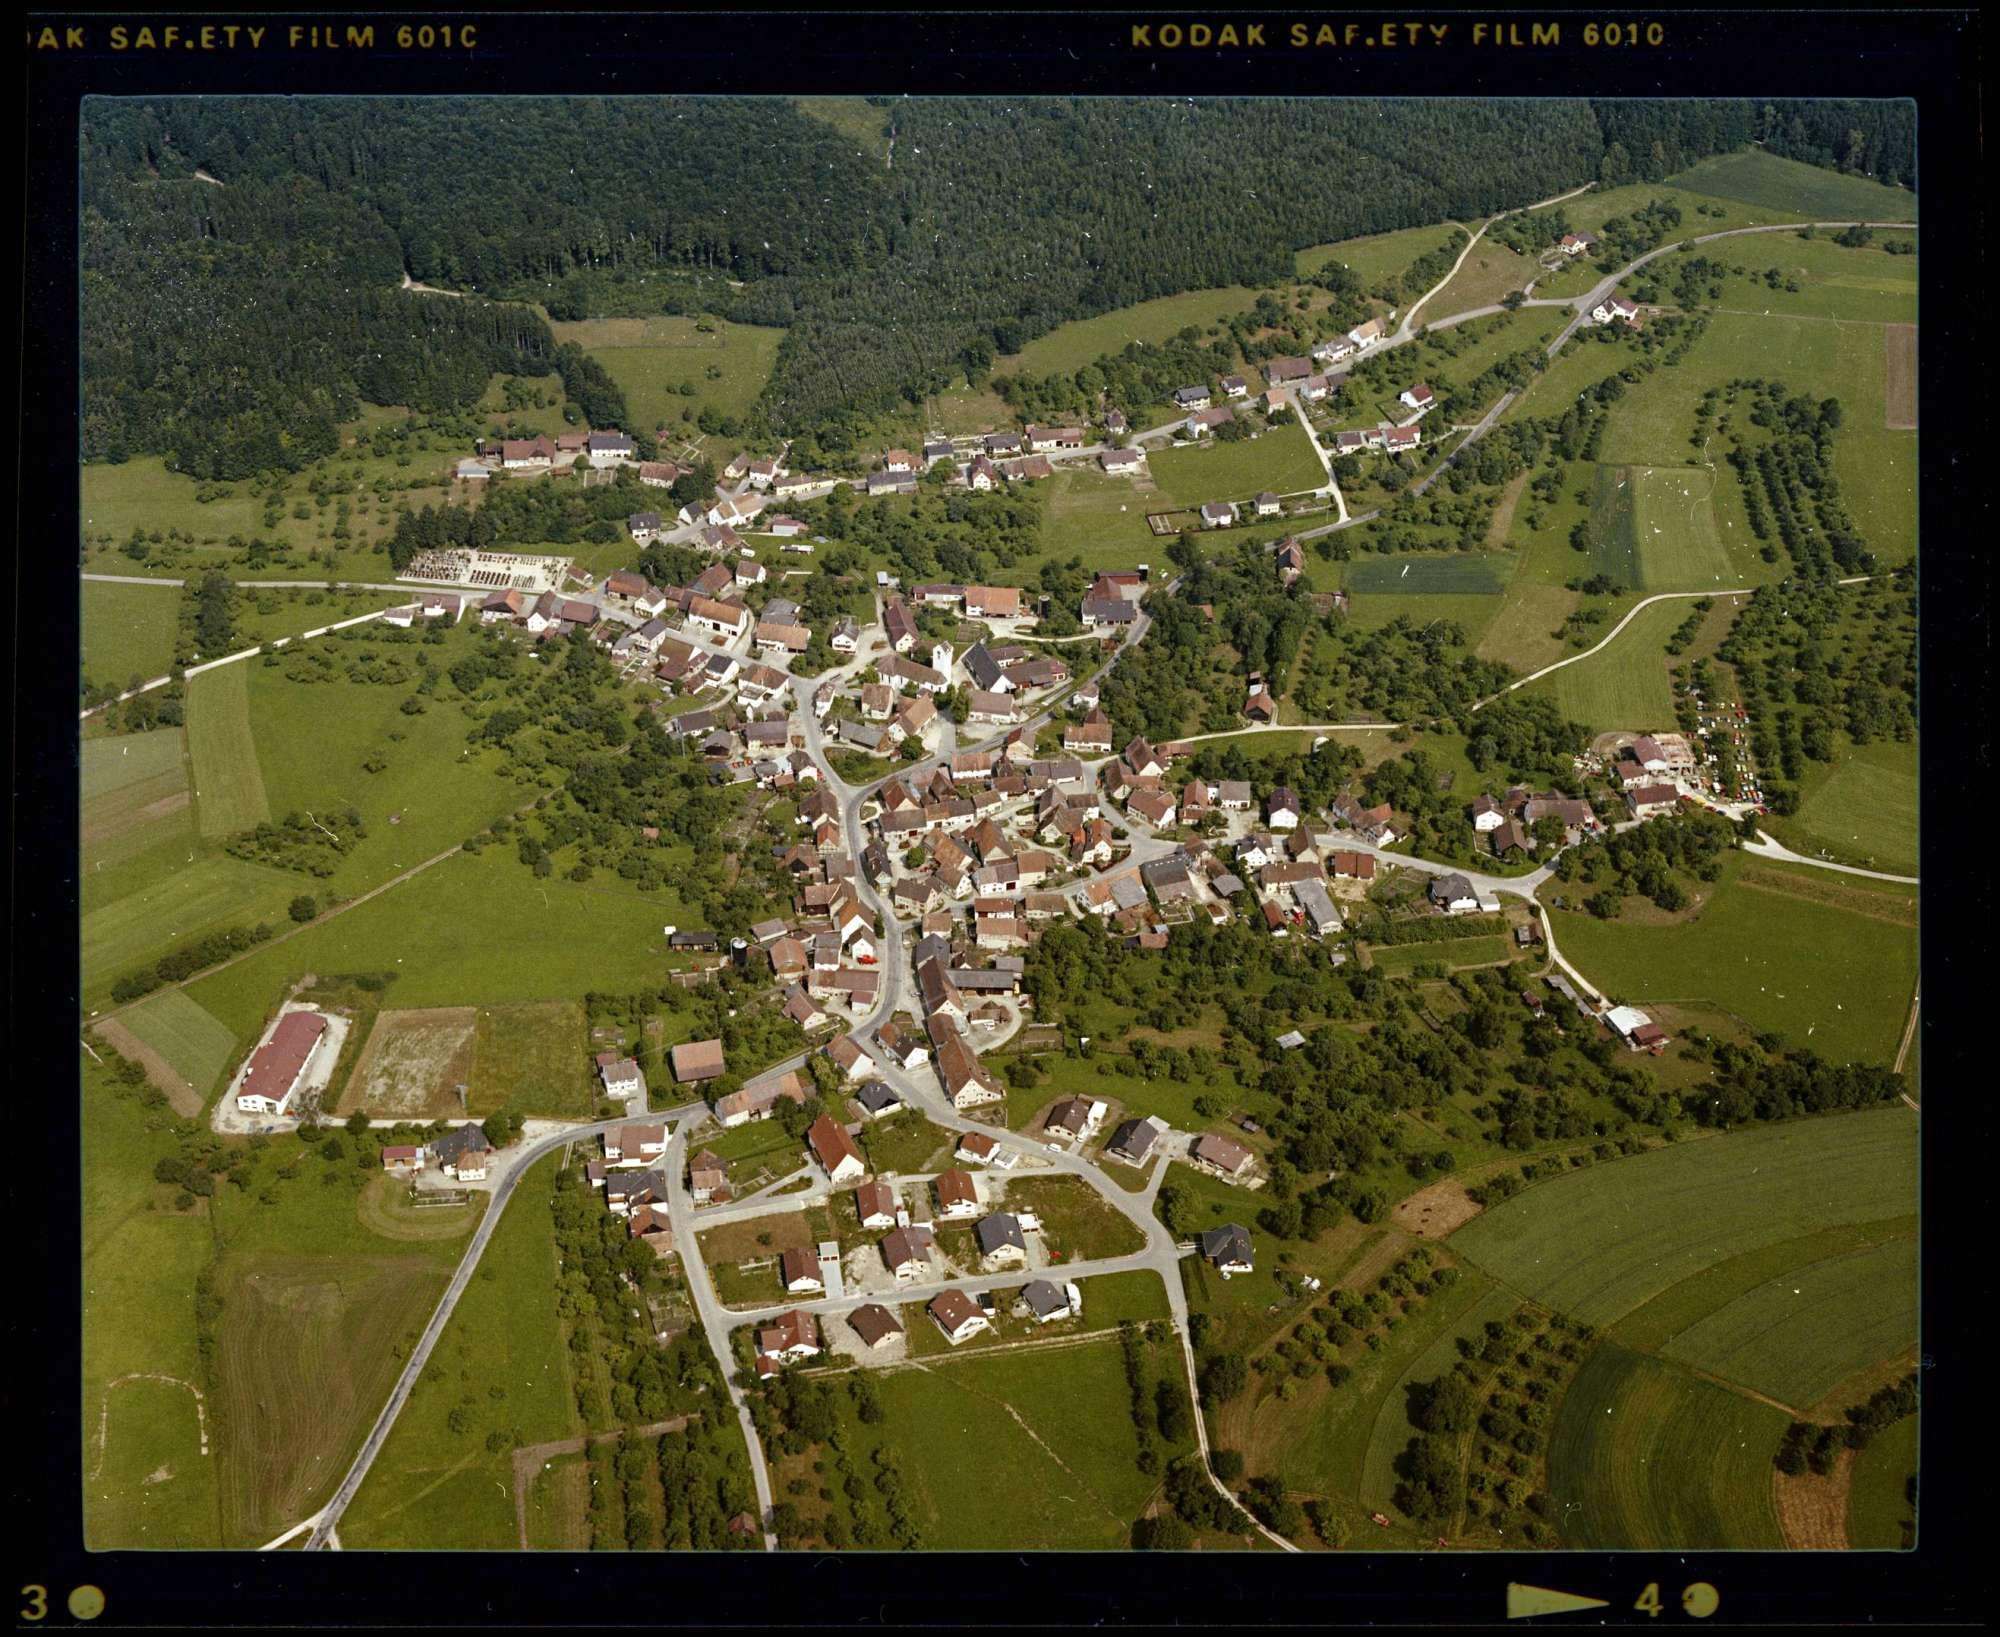 Heudorf im Hegau, Luftbild, Bild 1